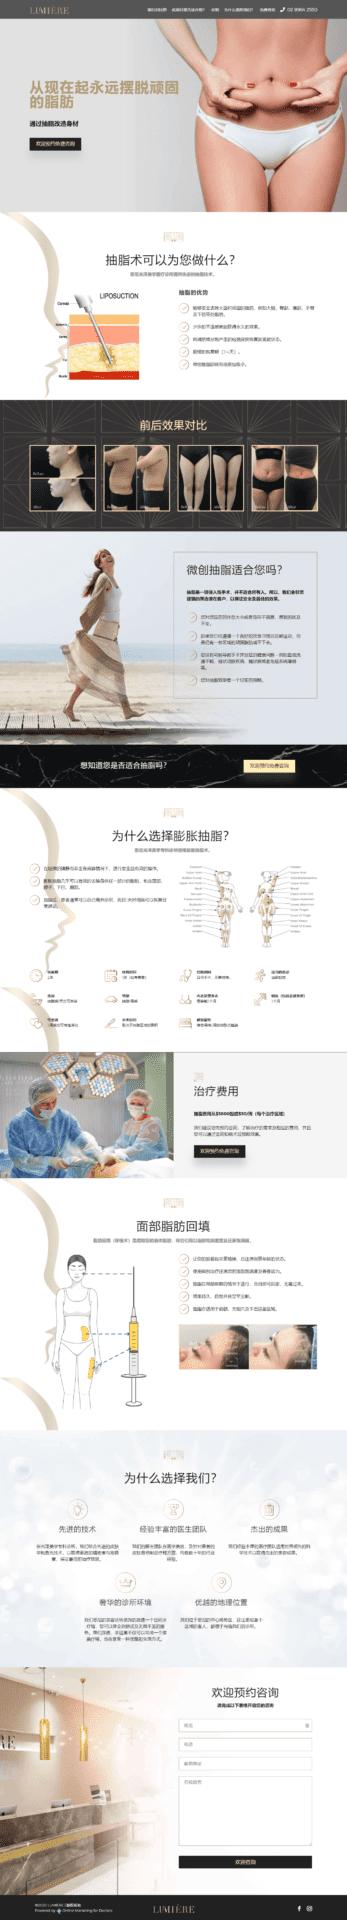 Lumière Beauty Clinic liposuction landing page